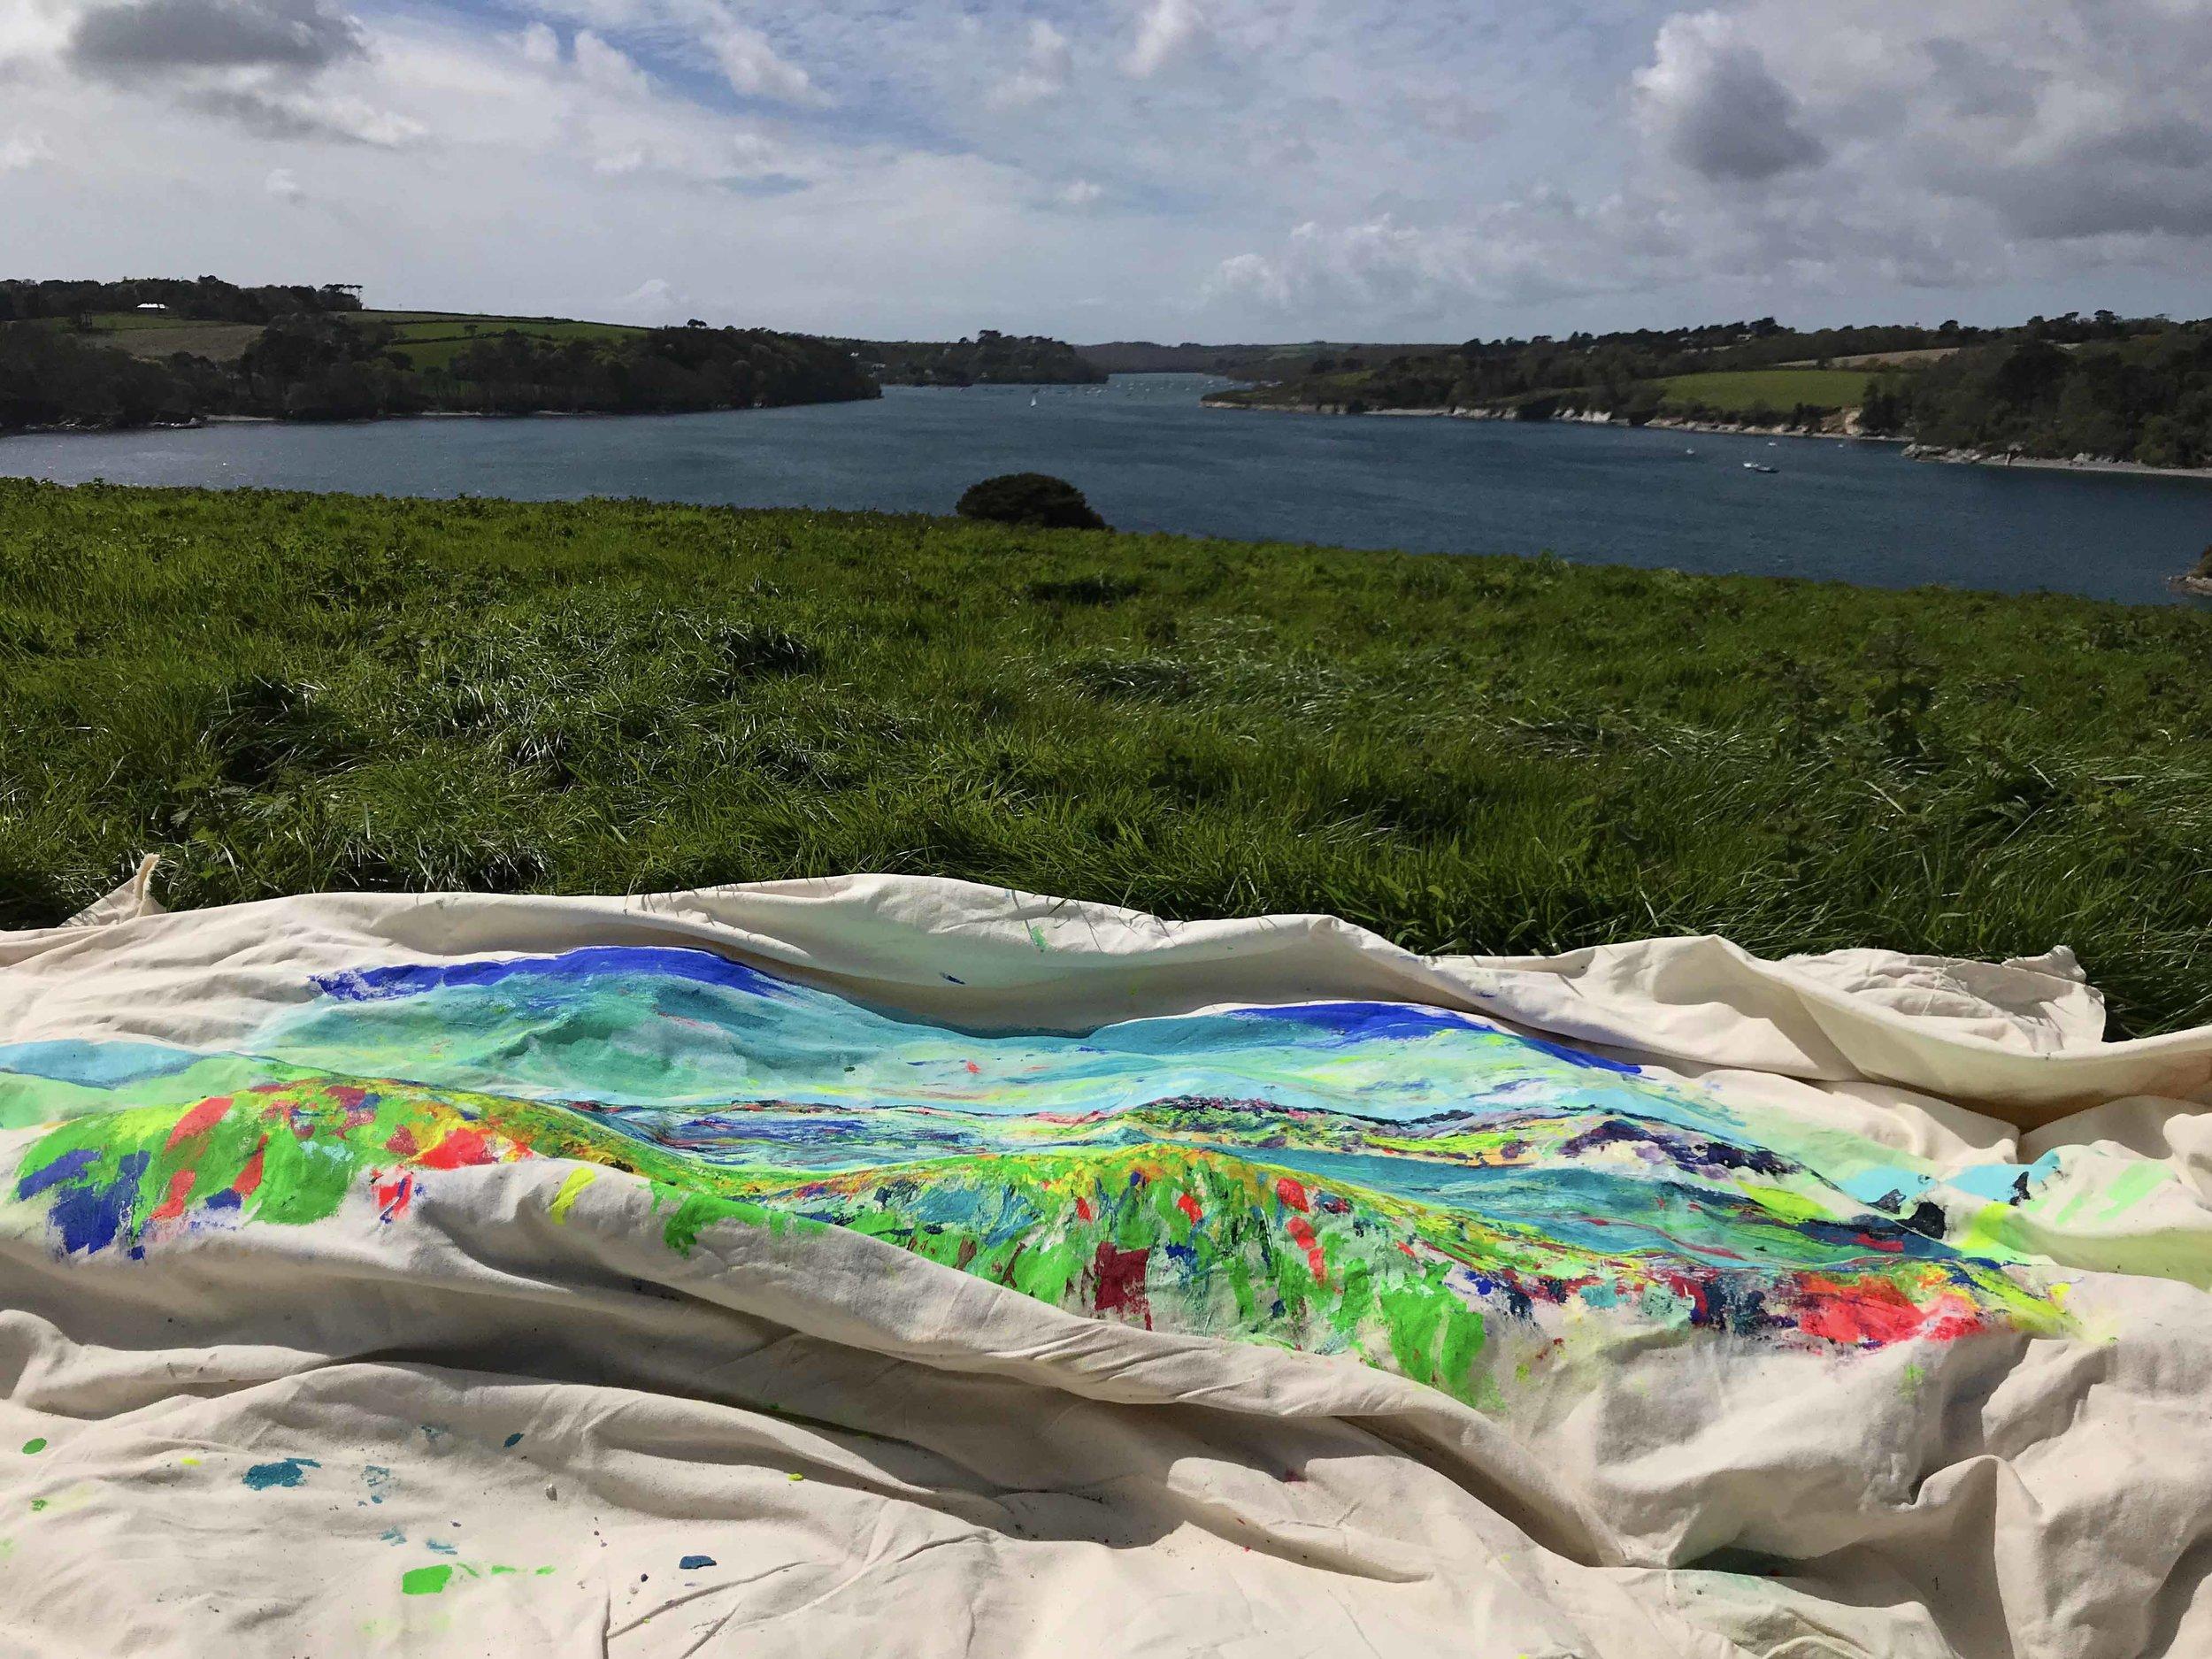 180717 Chloë Tinsley Cornish Artist Painting in Situ on the Helford River Cornwall low res.jpg